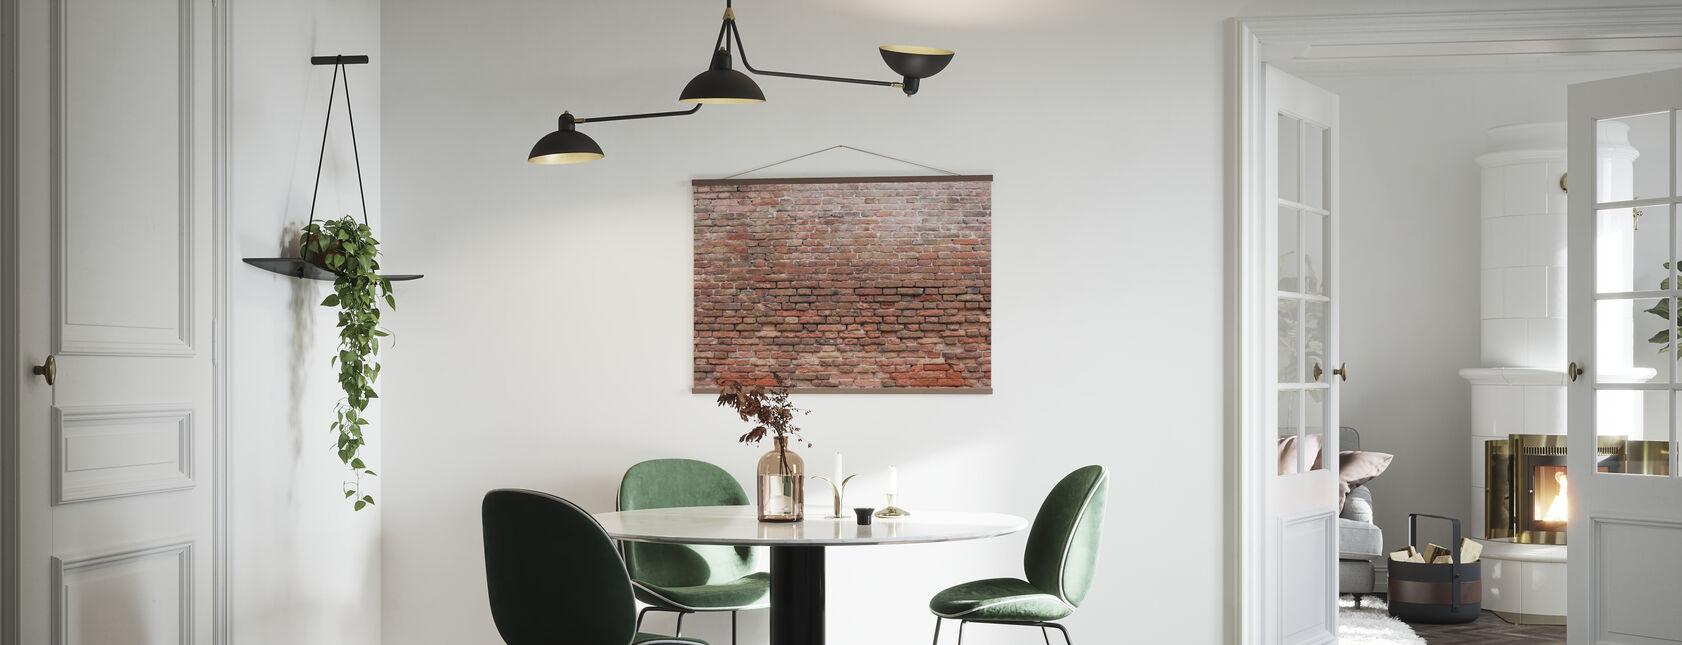 Vervallige bakstenen muur - Poster - Keuken